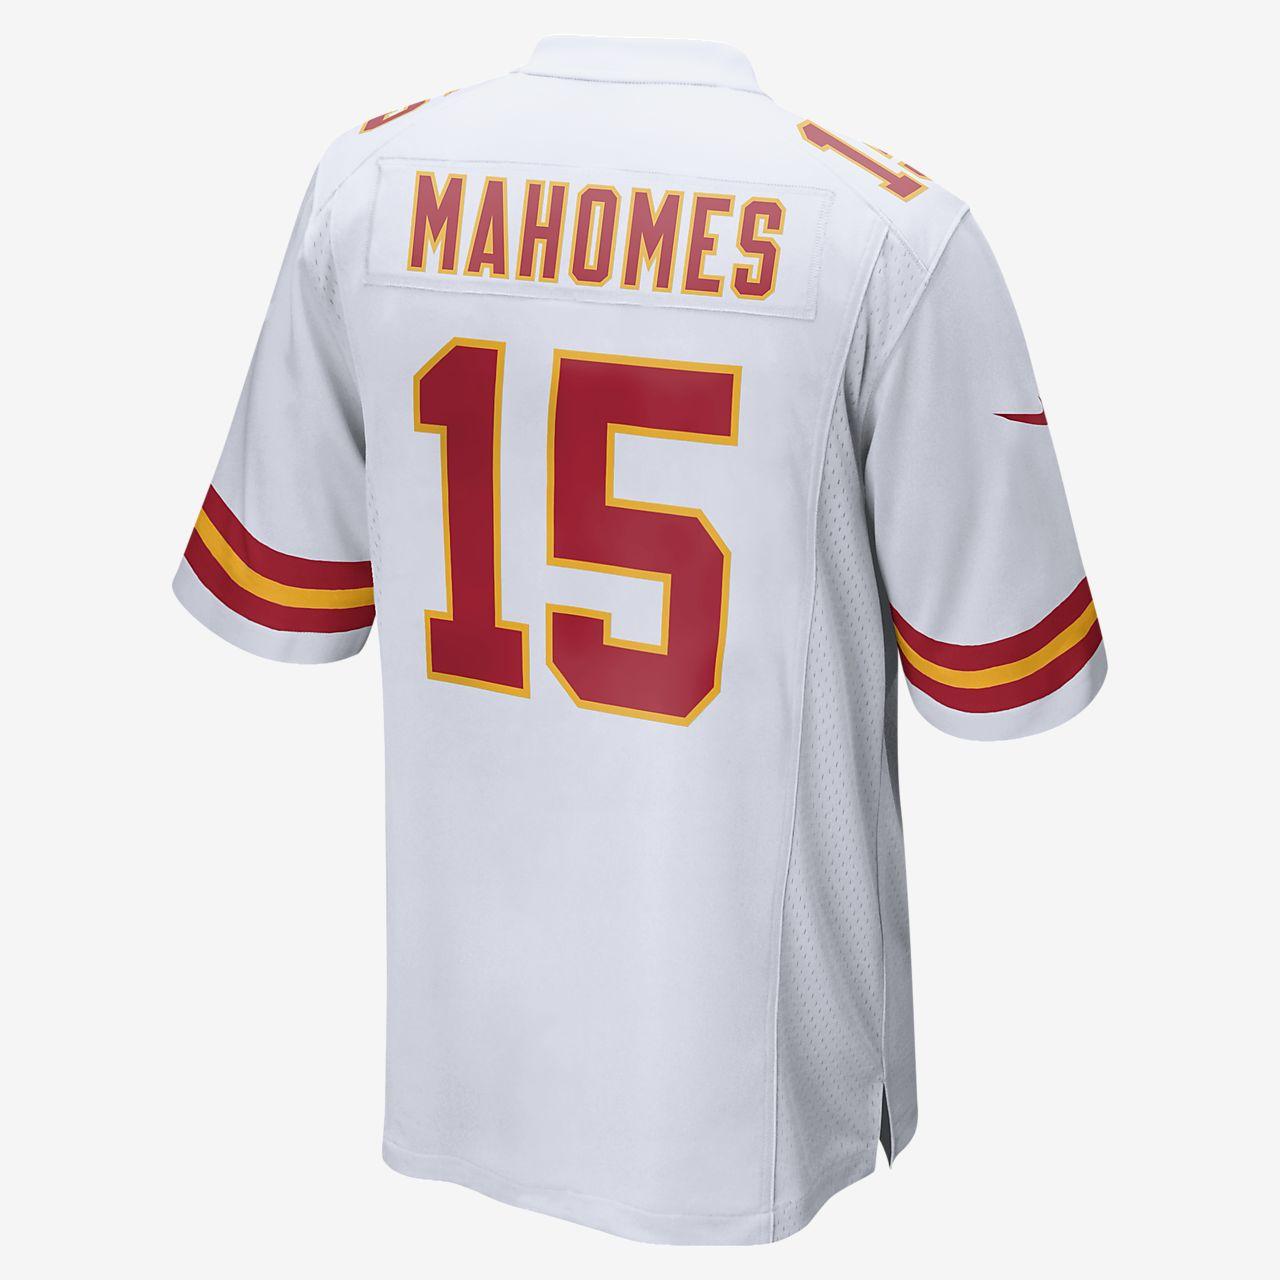 huge discount fc16e 79ea7 NFL Kansas City Chiefs Game (Patrick Mahomes) Men's Football Jersey